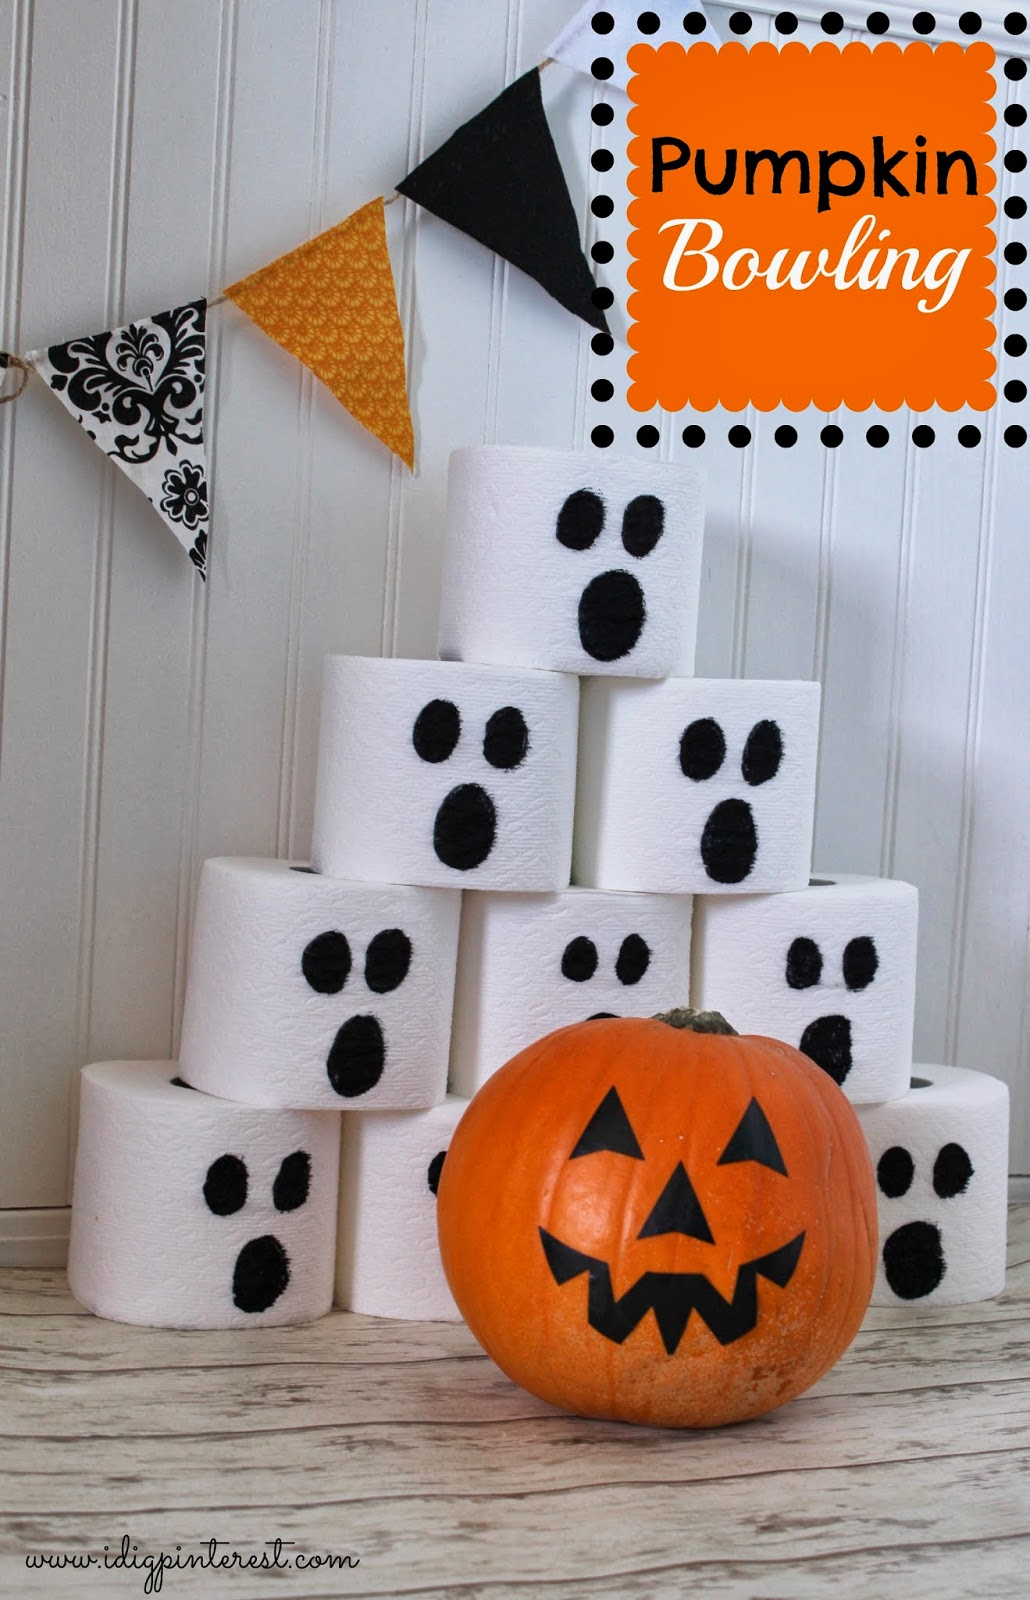 Pumpkin Bowling Halloween Party Game